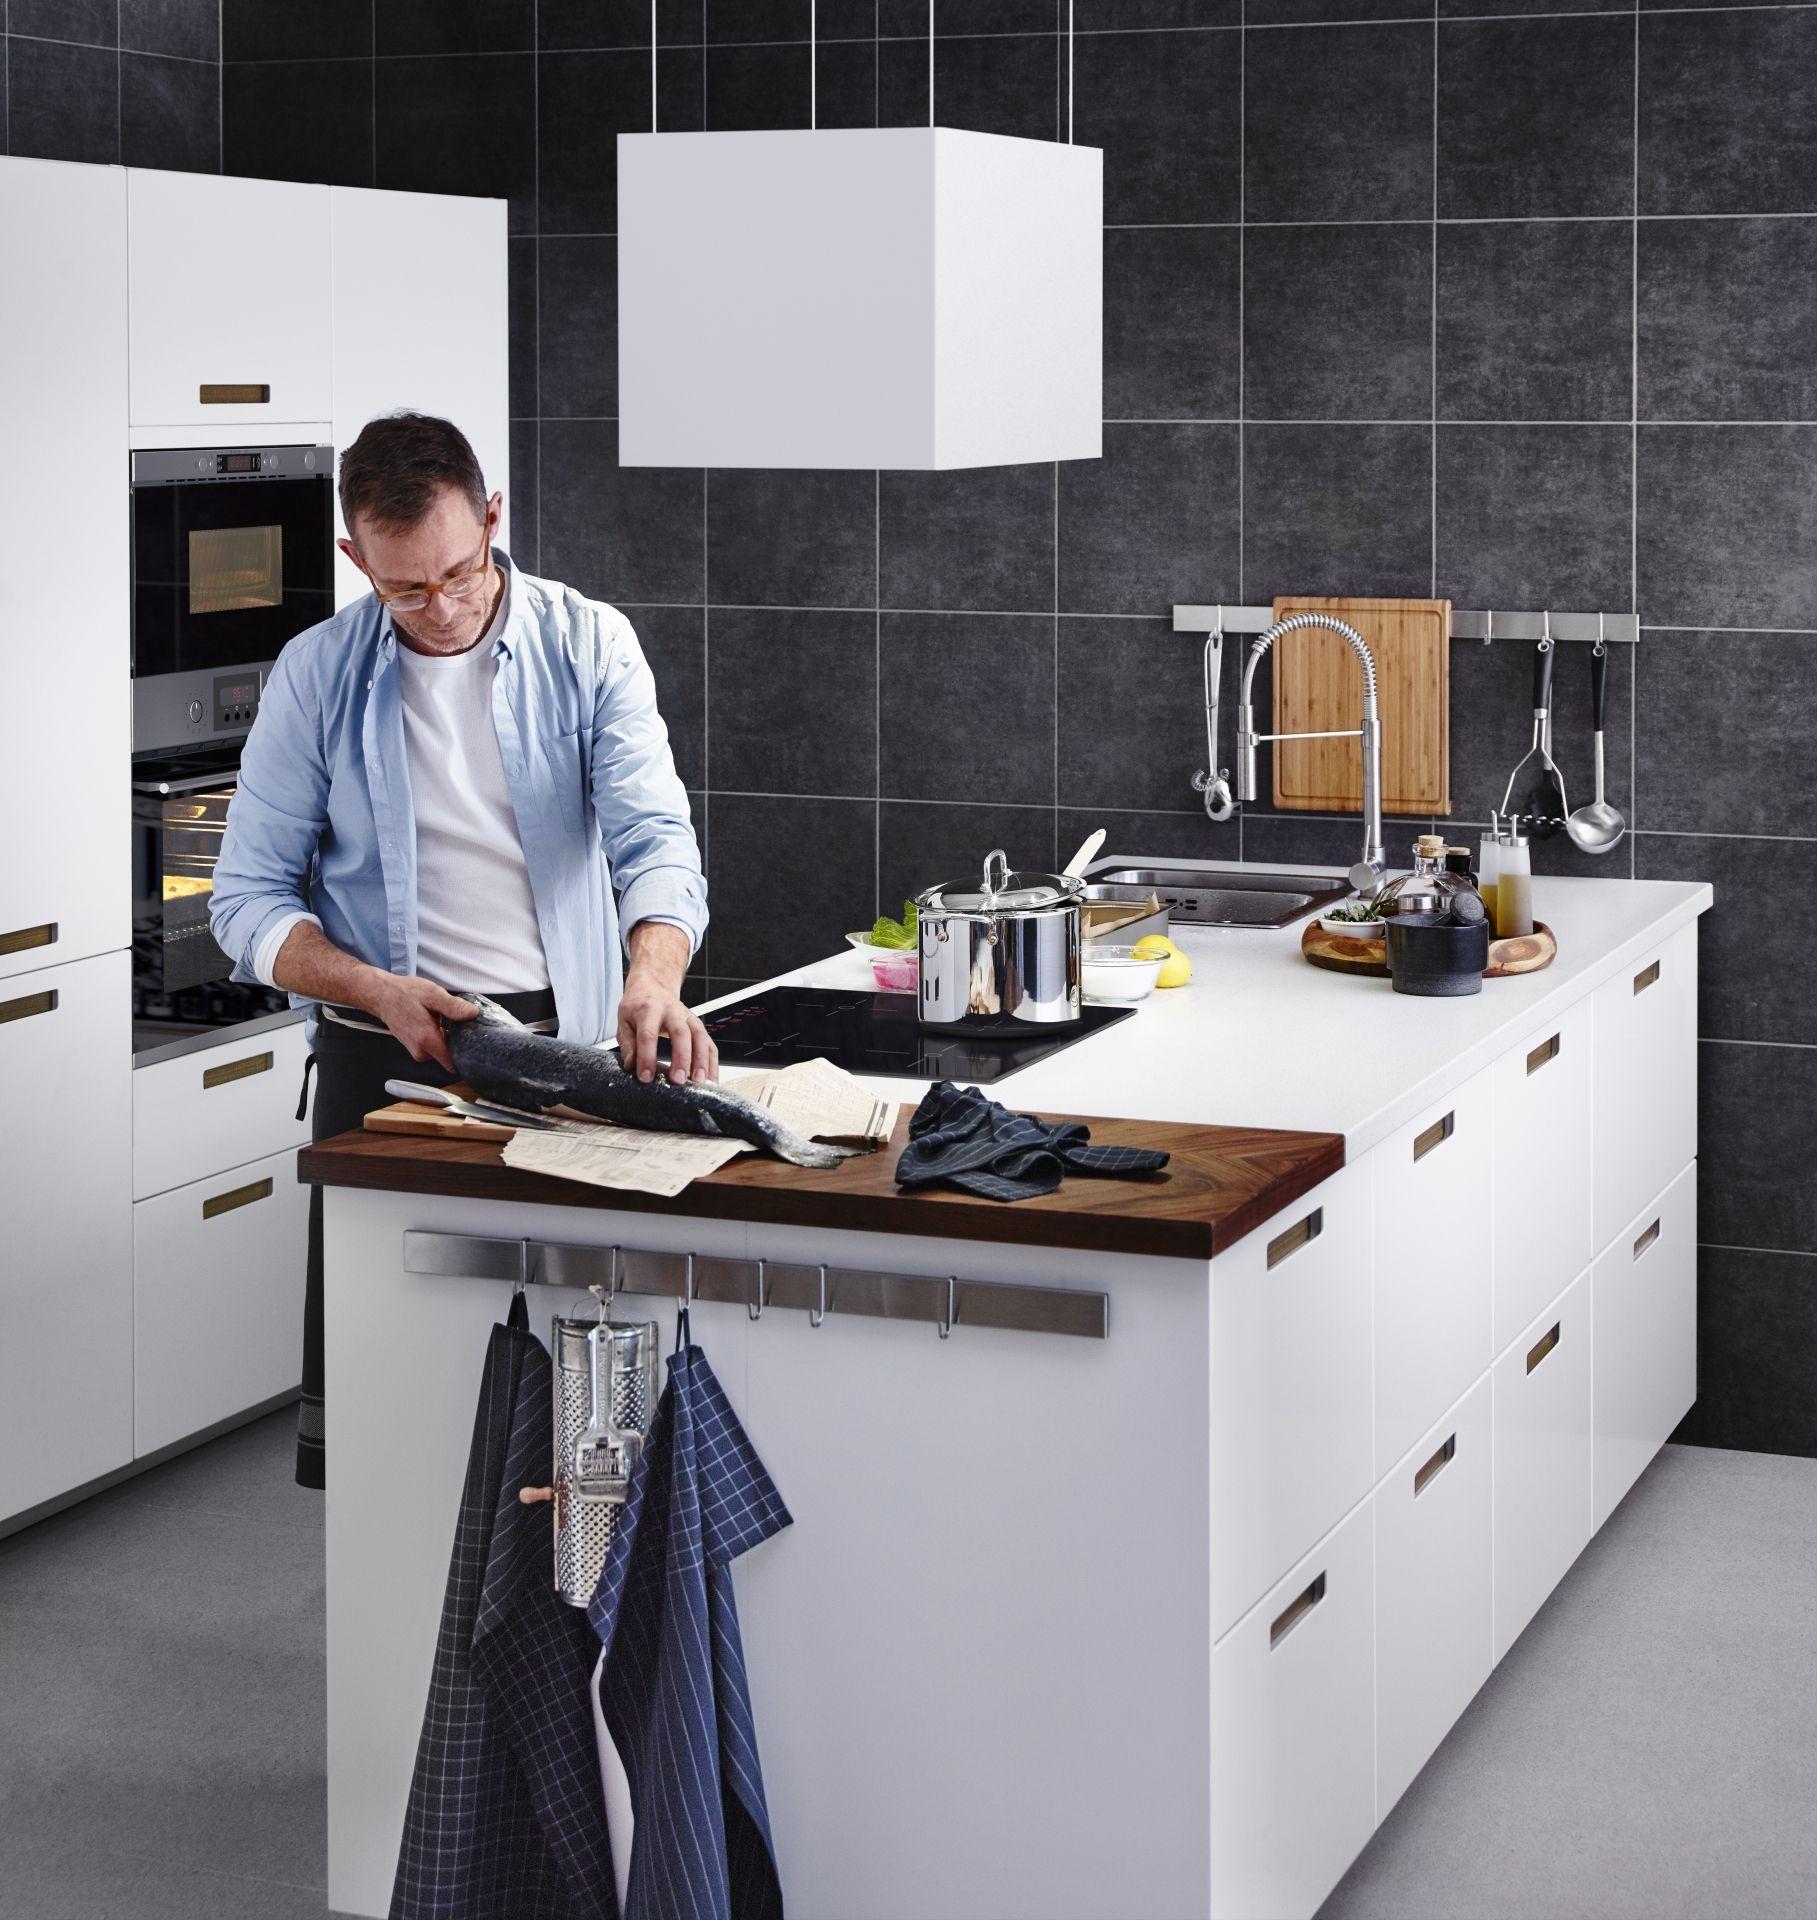 f52f2b832ceee2b45b5efa863bf7542b Frais De Bar Ikea Cuisine Concept